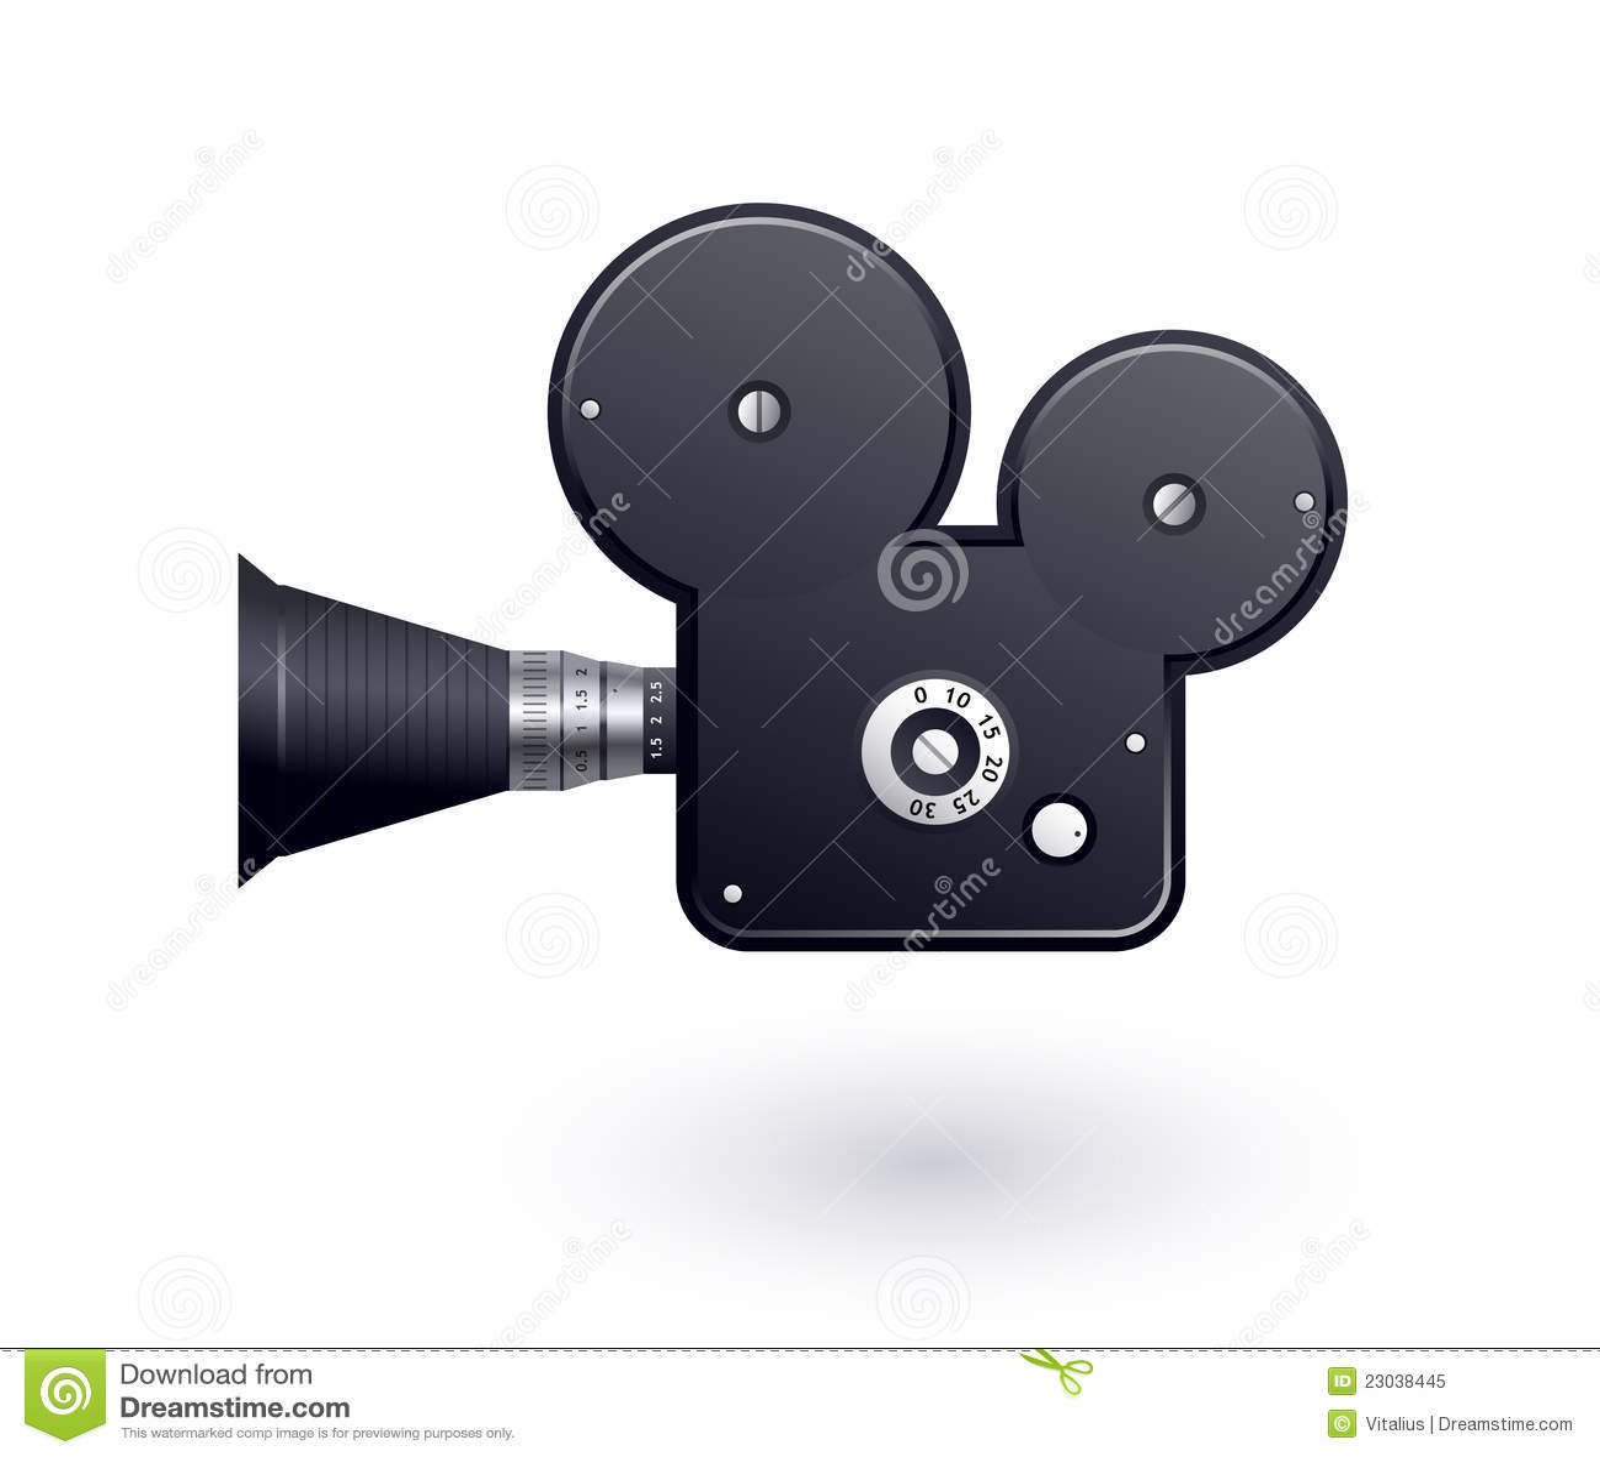 Video Camera Icon Royalty Free Stock Photo - Image: 23038445